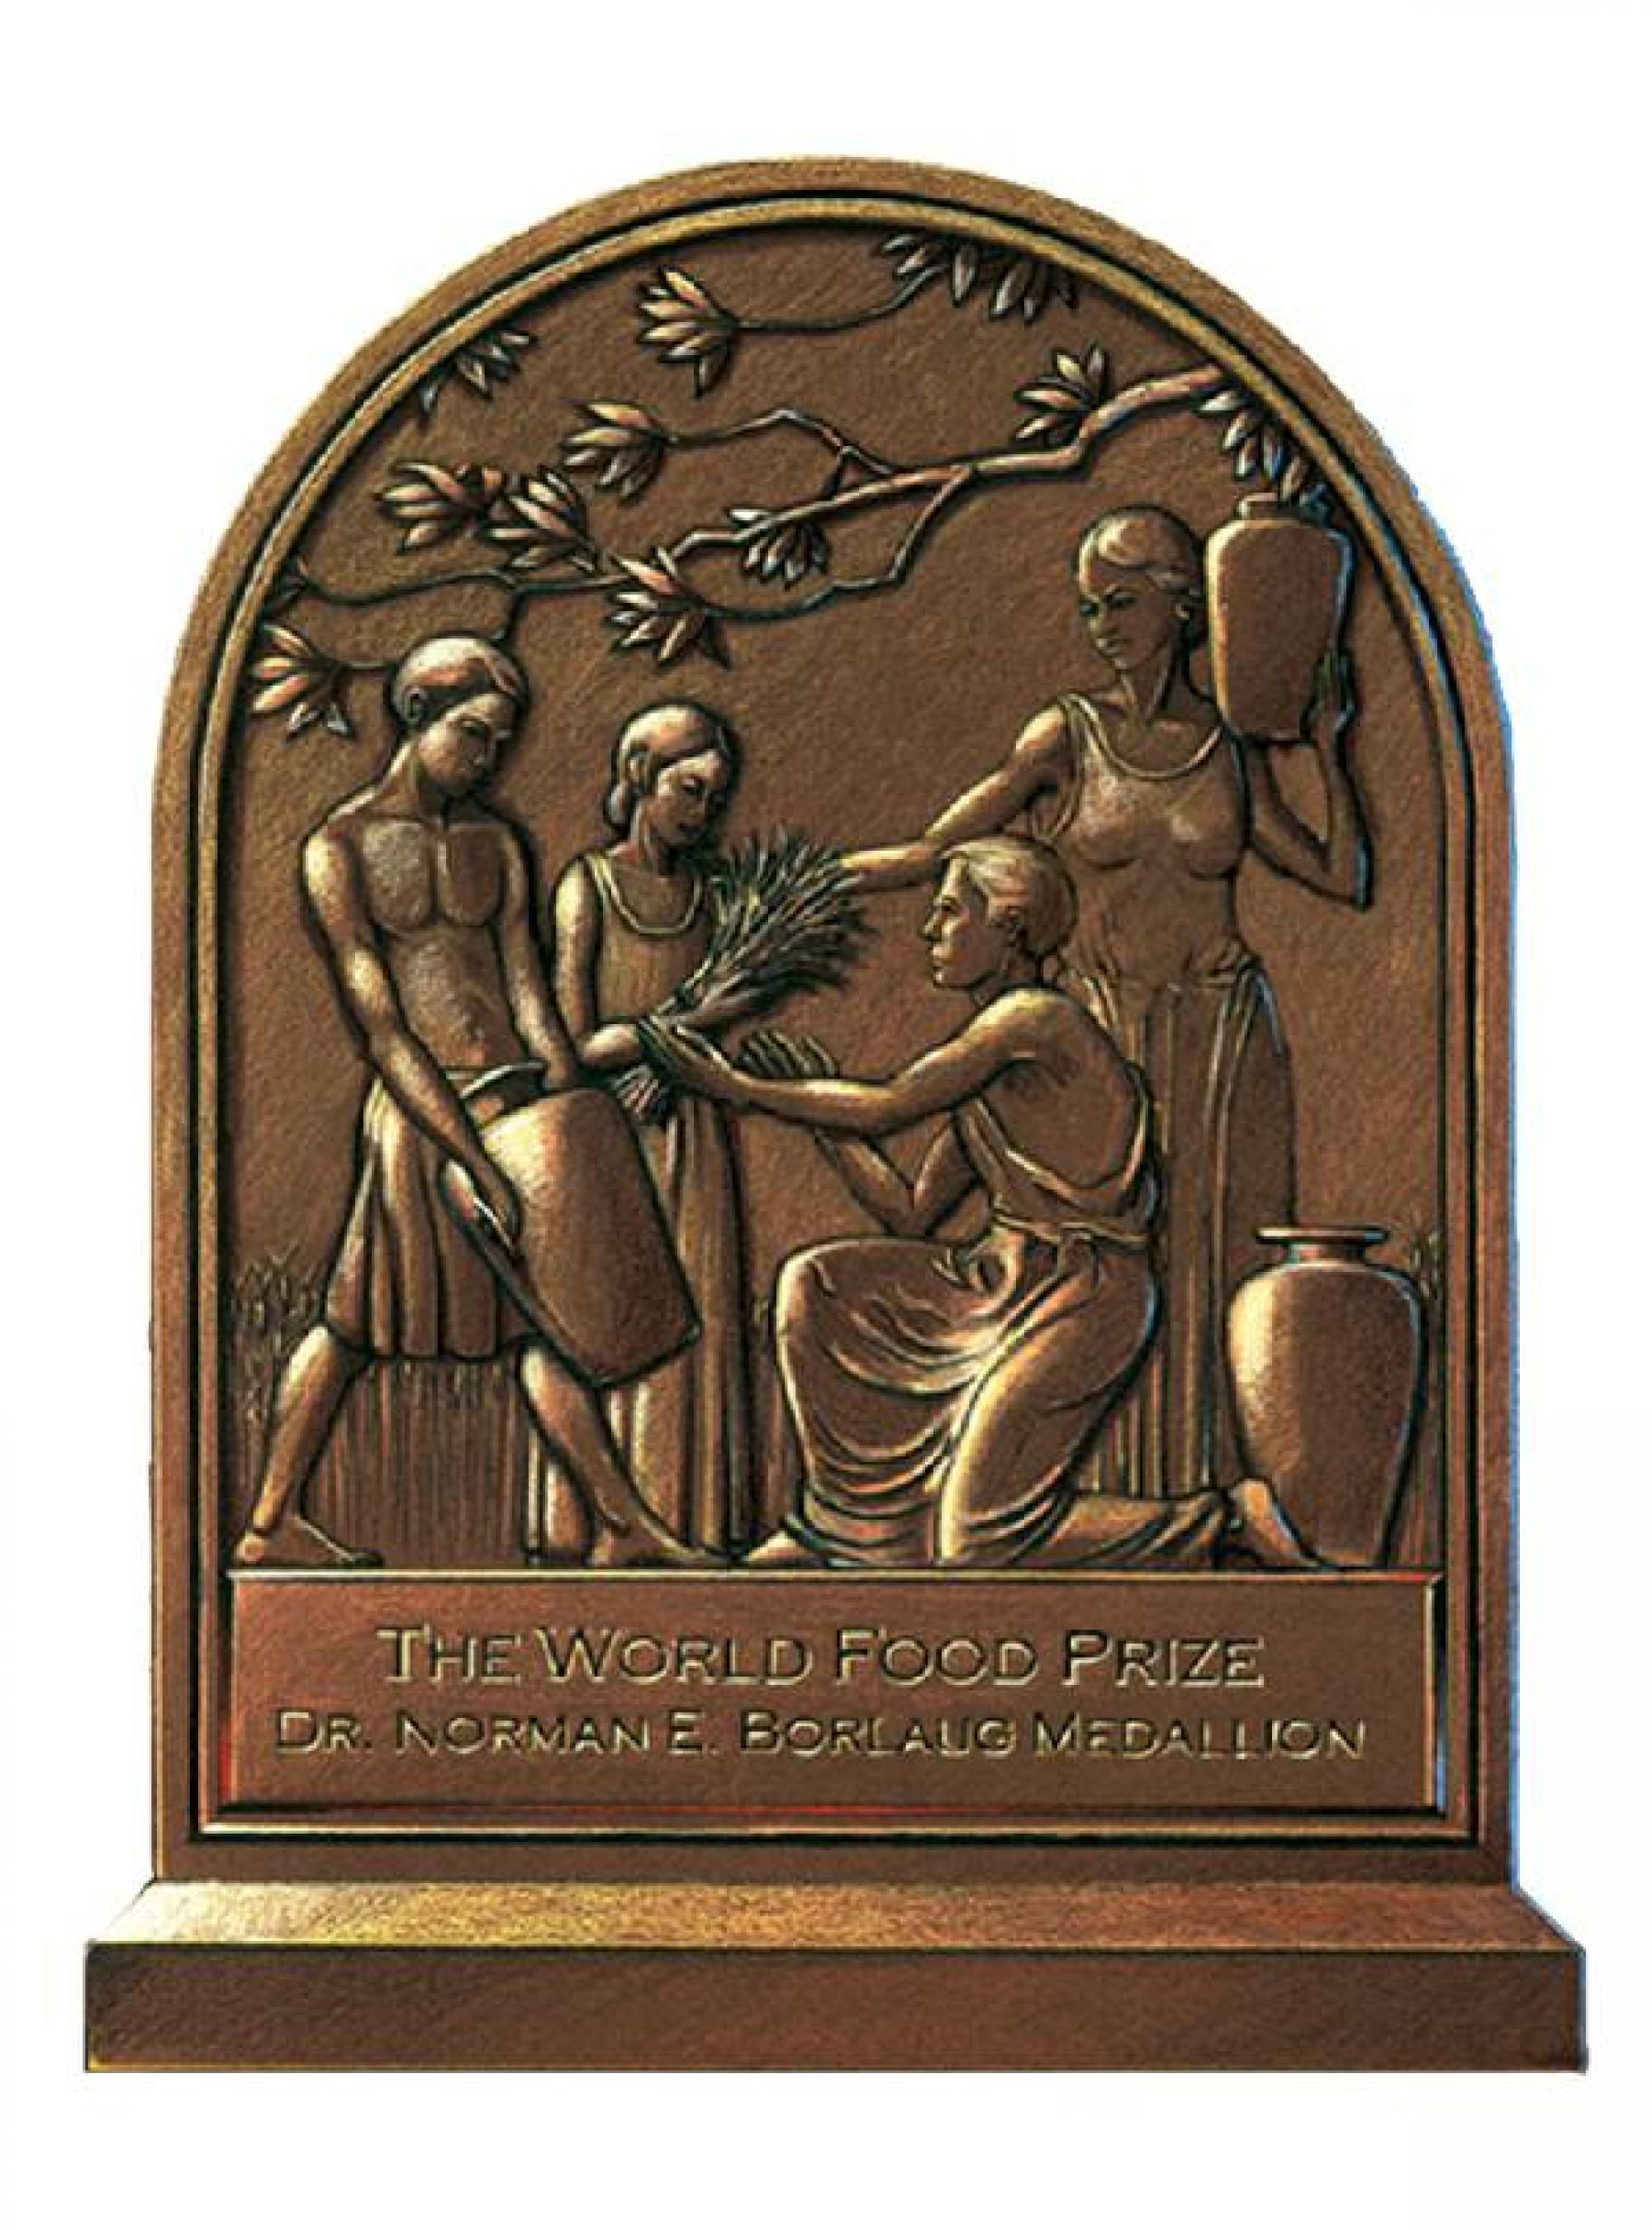 The World Food Prize Foundation Borlaug Medallion, awarded recently to land-grant universities including the UA.